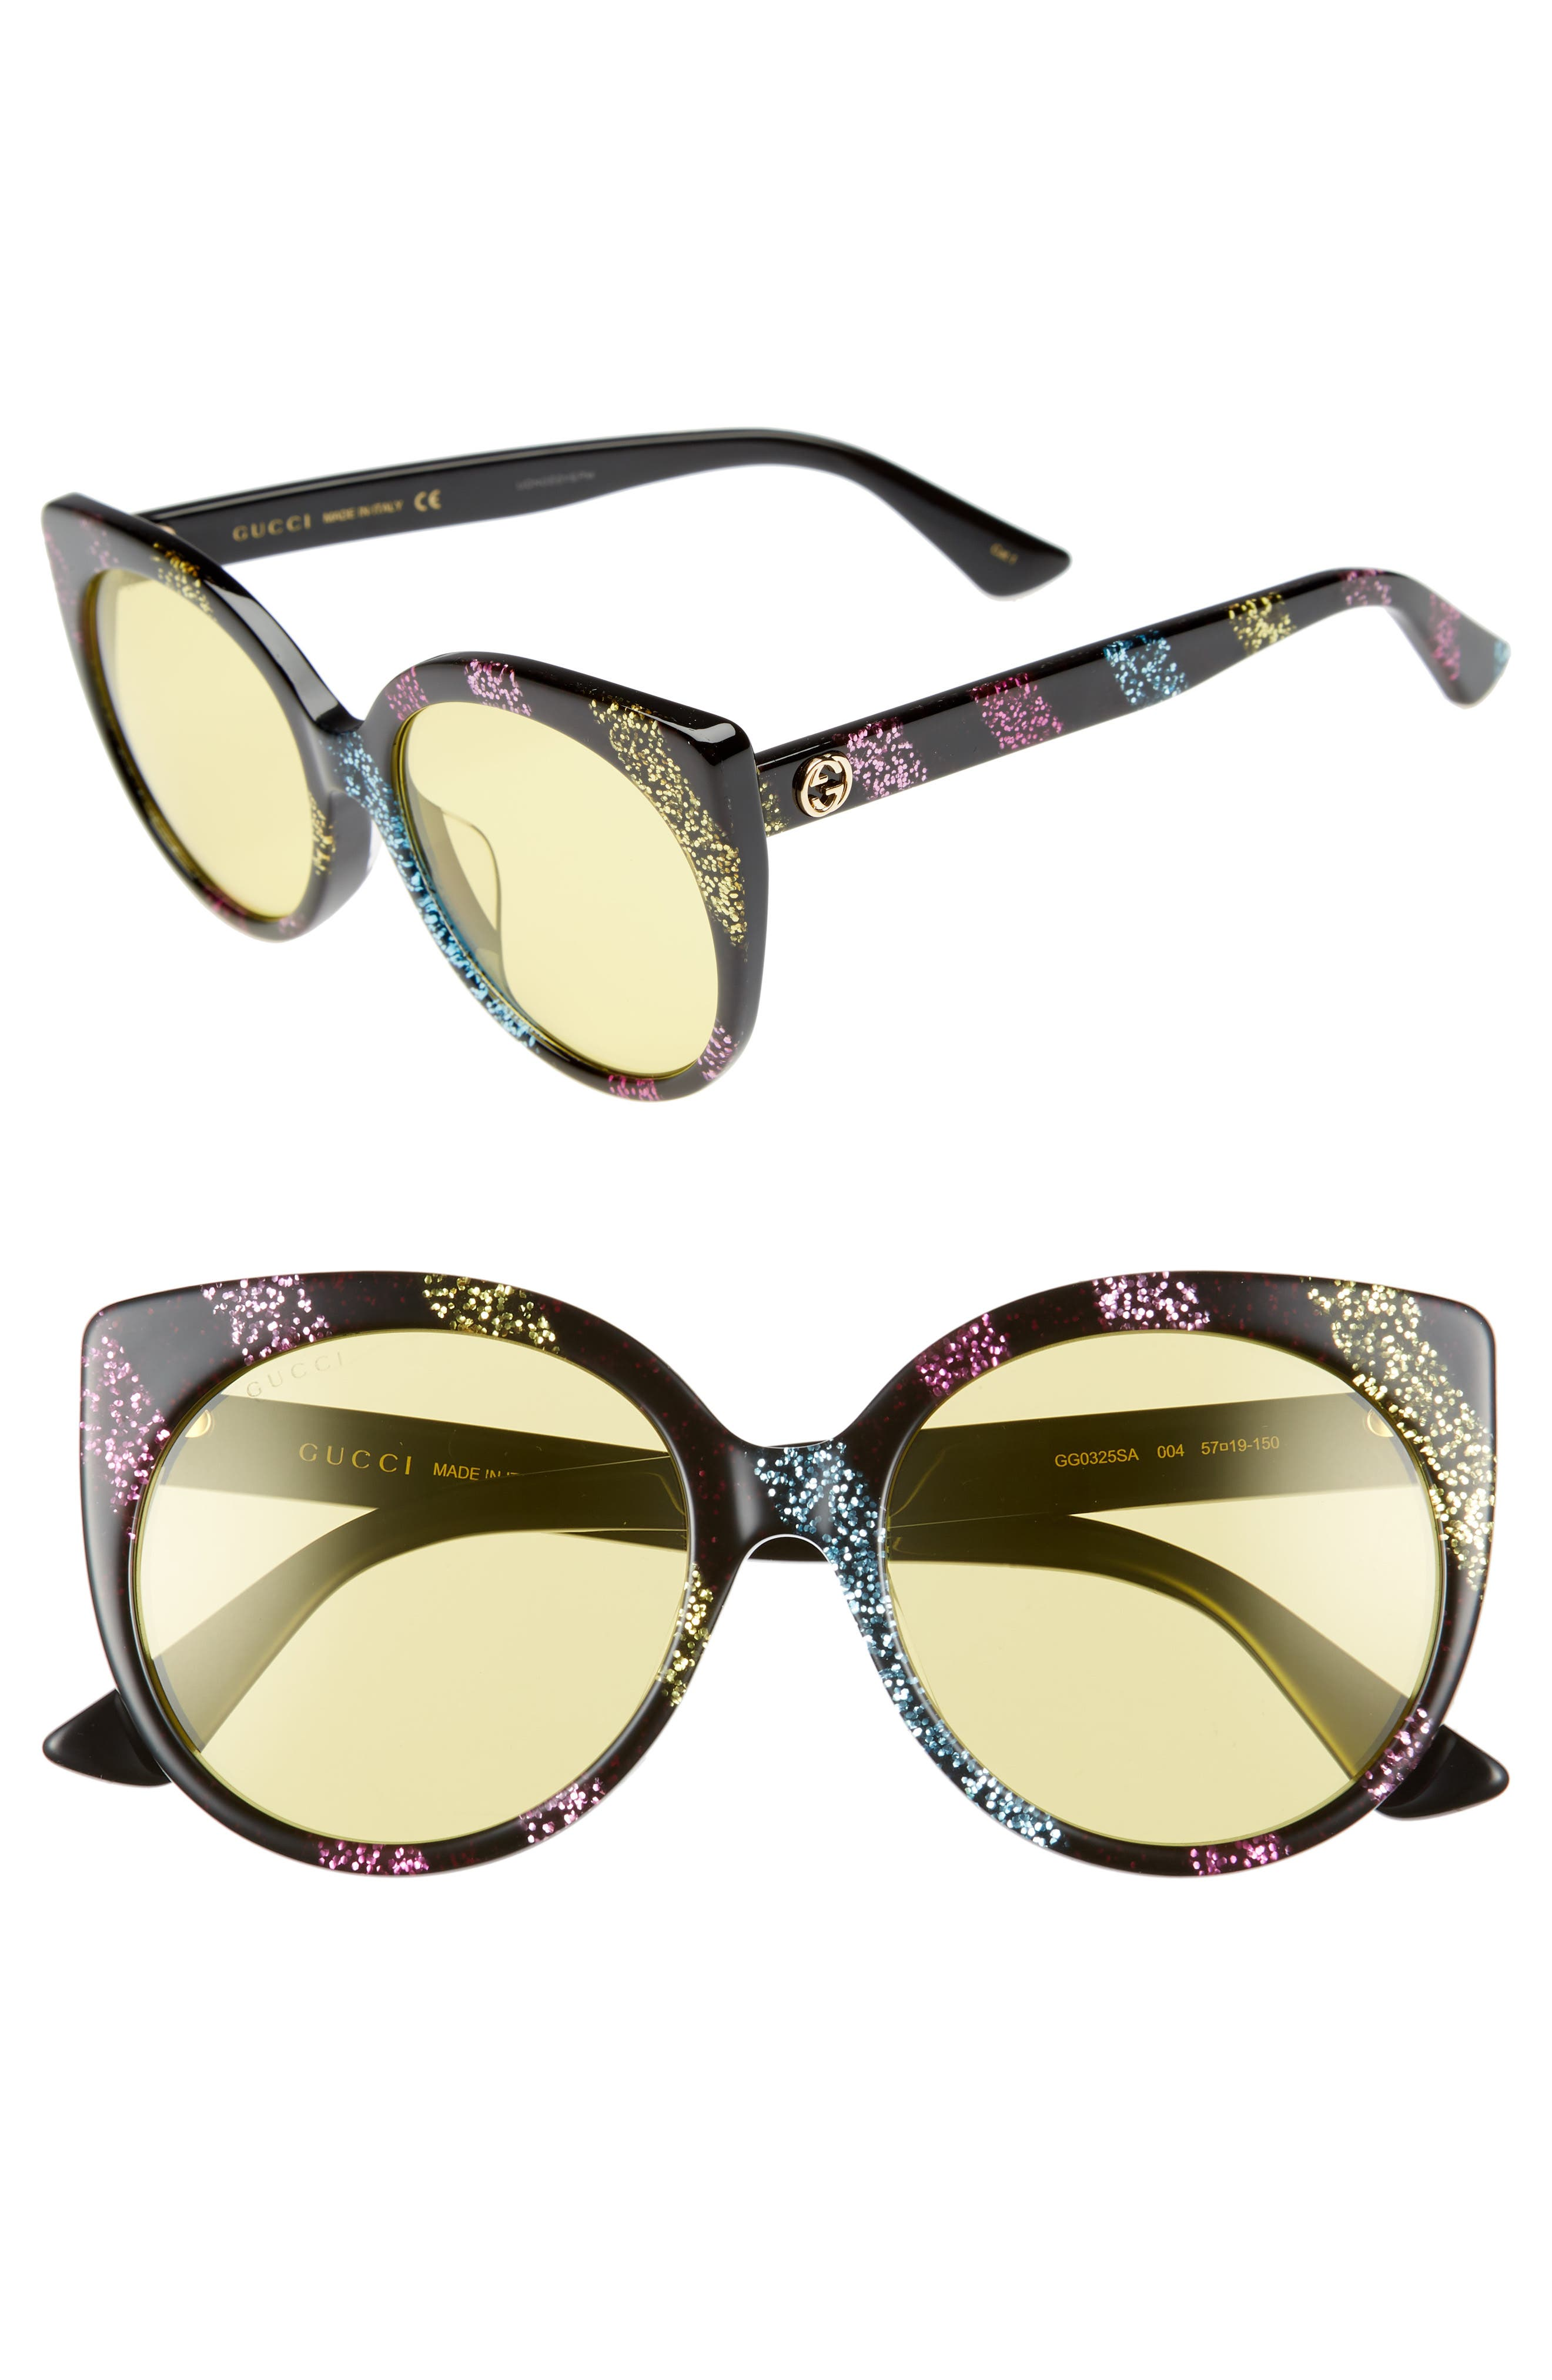 57mm Cat Eye Sunglasses,                         Main,                         color, Pink/ Multicolor